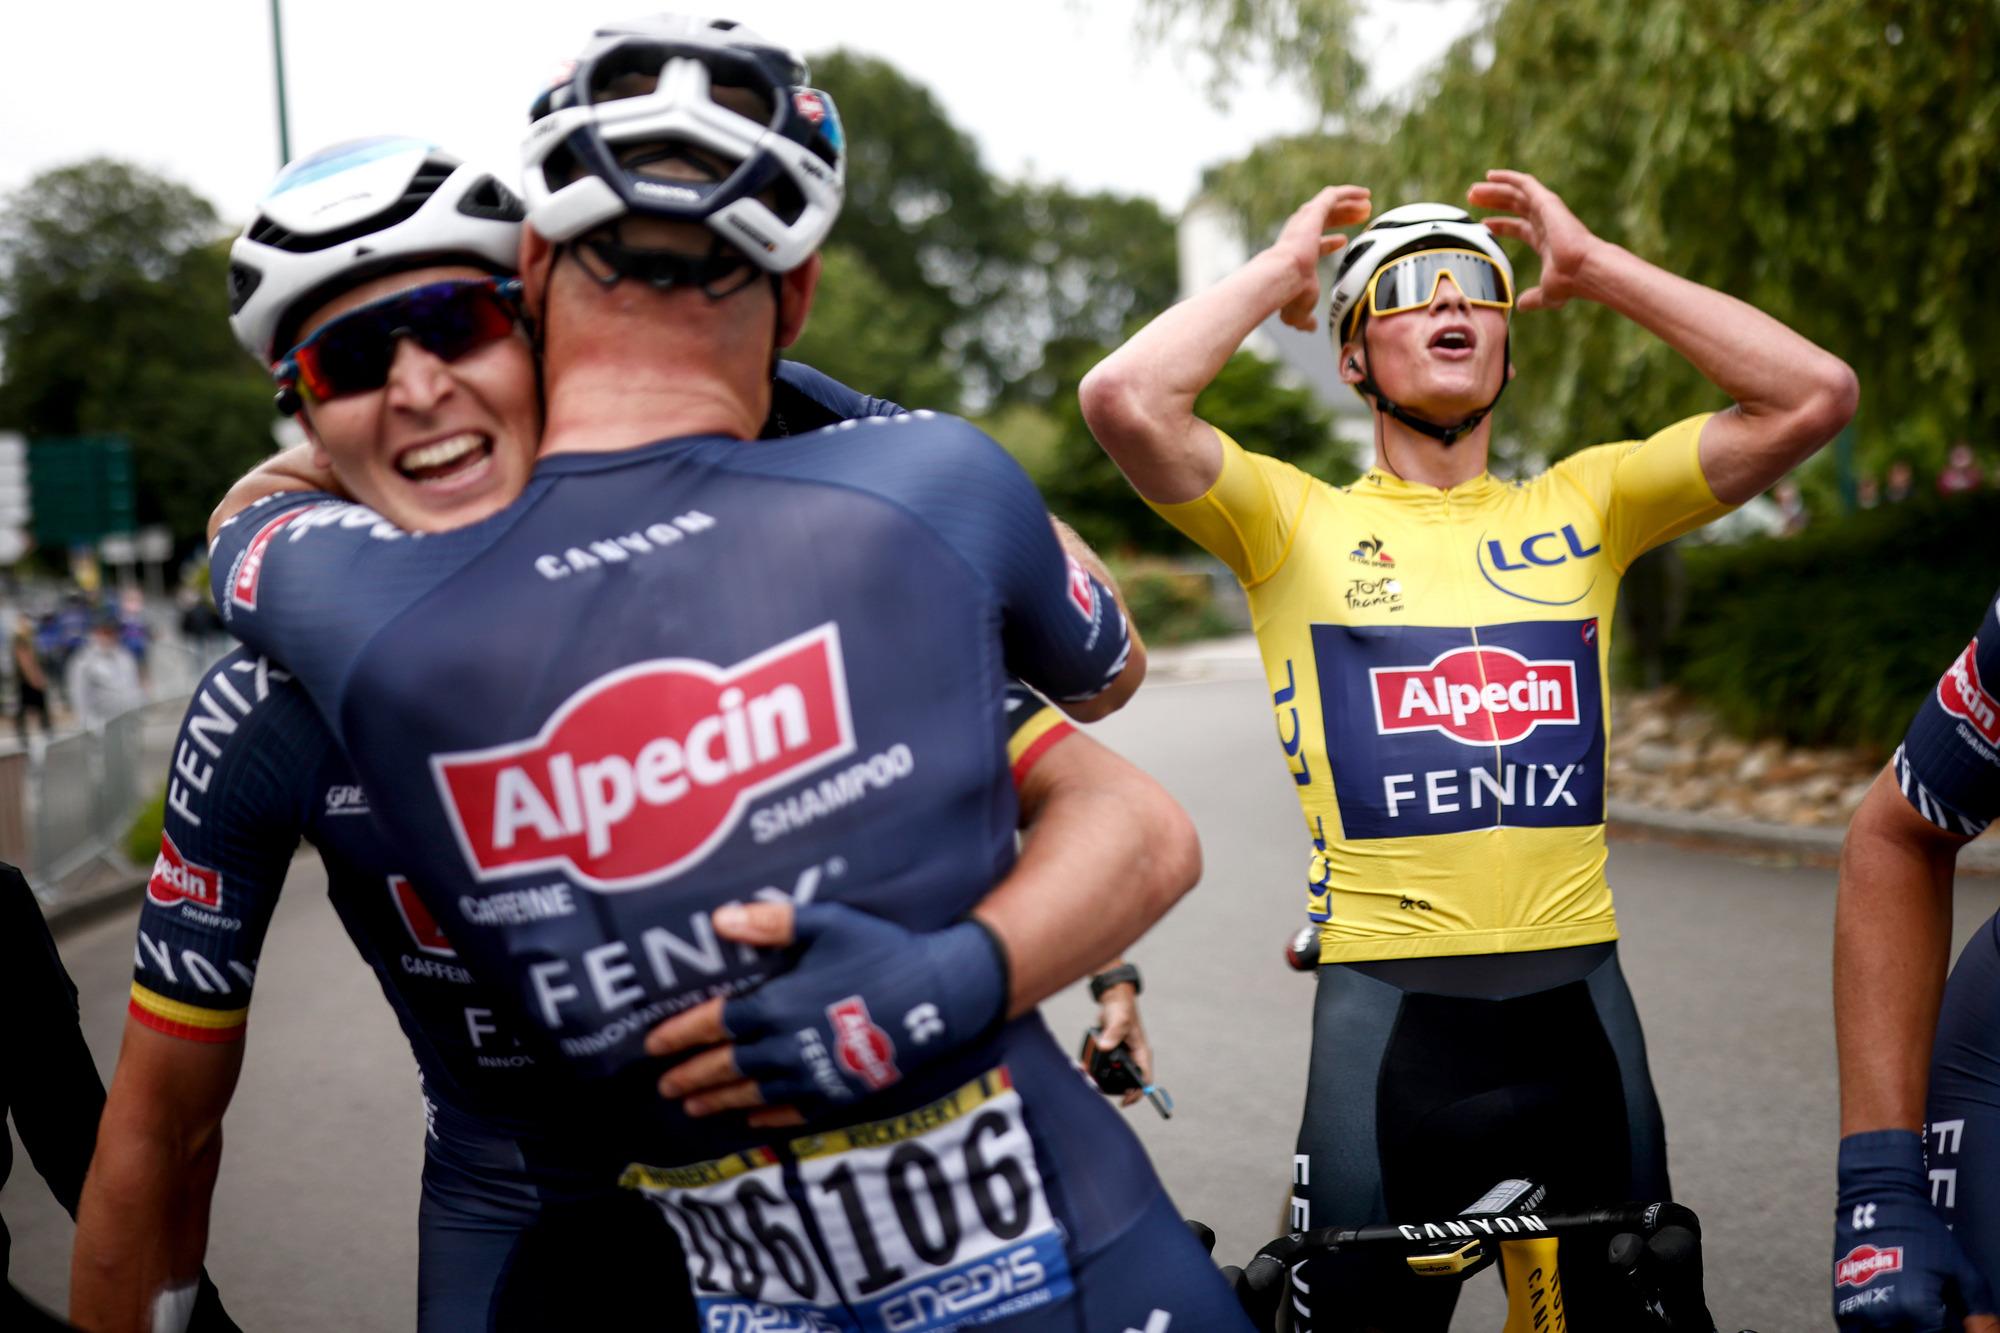 Tour de France 2021 108th Edition 3rd stage Lorient Pontivy 1829 km 28062021 Tim Merlier BEL AlpecinFenix Jasper Philipsen BEL AlpecinFenix photo POOL Stephane MaheBettiniPhoto2021